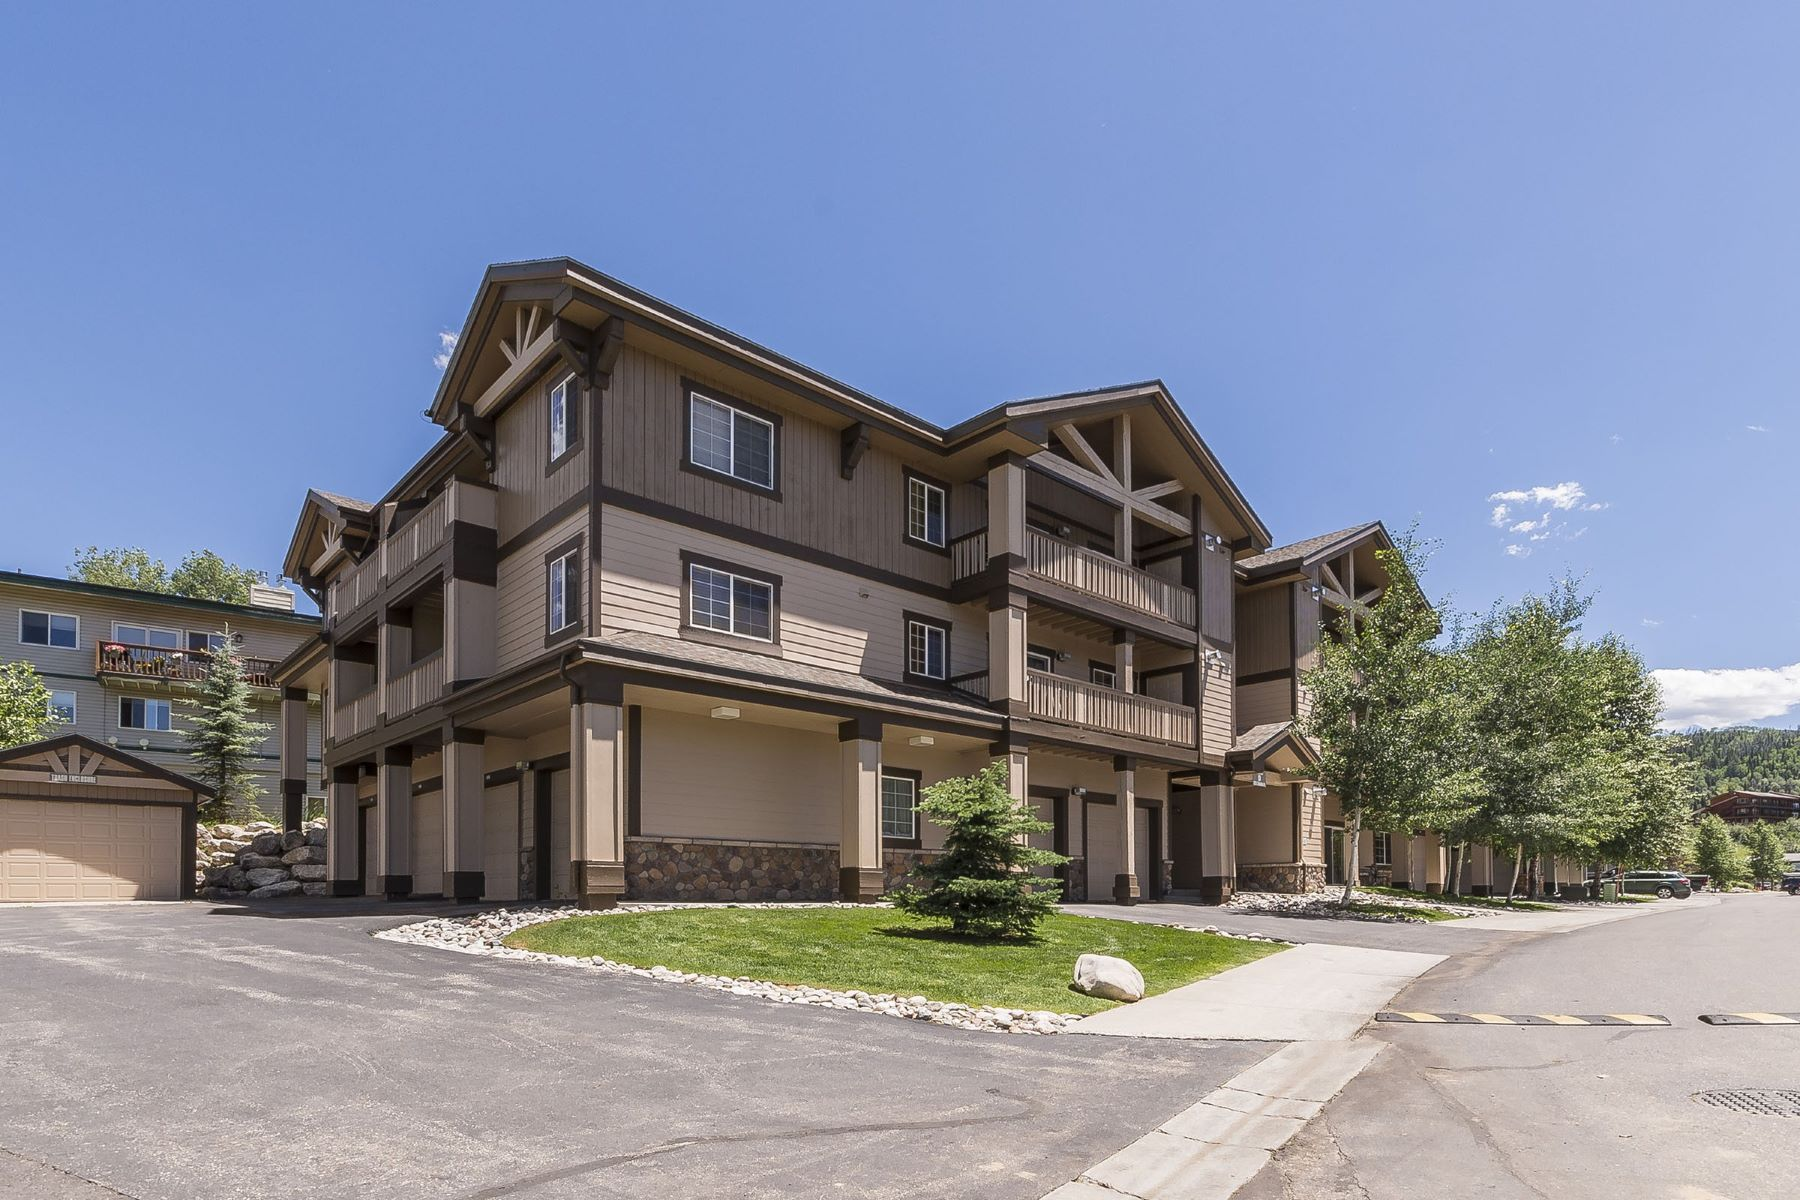 Condominium for Sale at Sunray Meadows Condo 3335 Columbine Drive #907 Steamboat Springs, Colorado 80487 United States